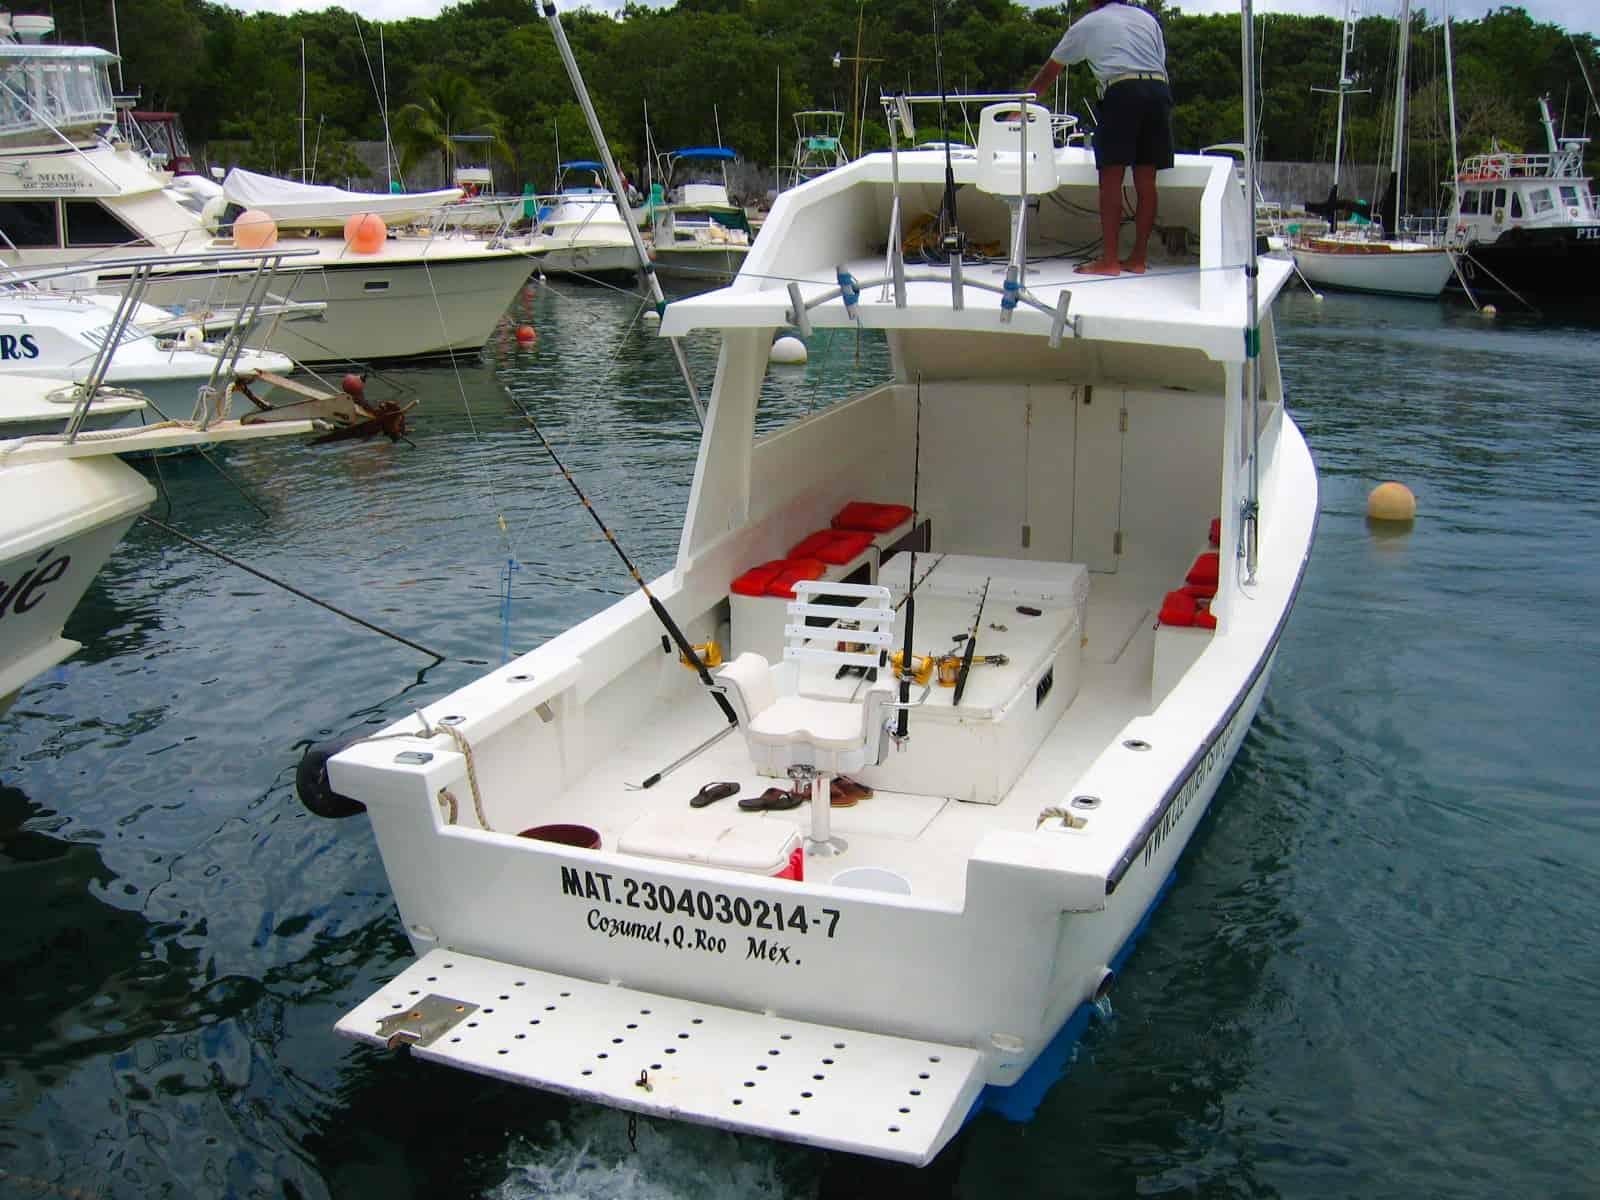 Cozumle deep sea fishing cozumel cruise excursions for Deep sea fishing st thomas